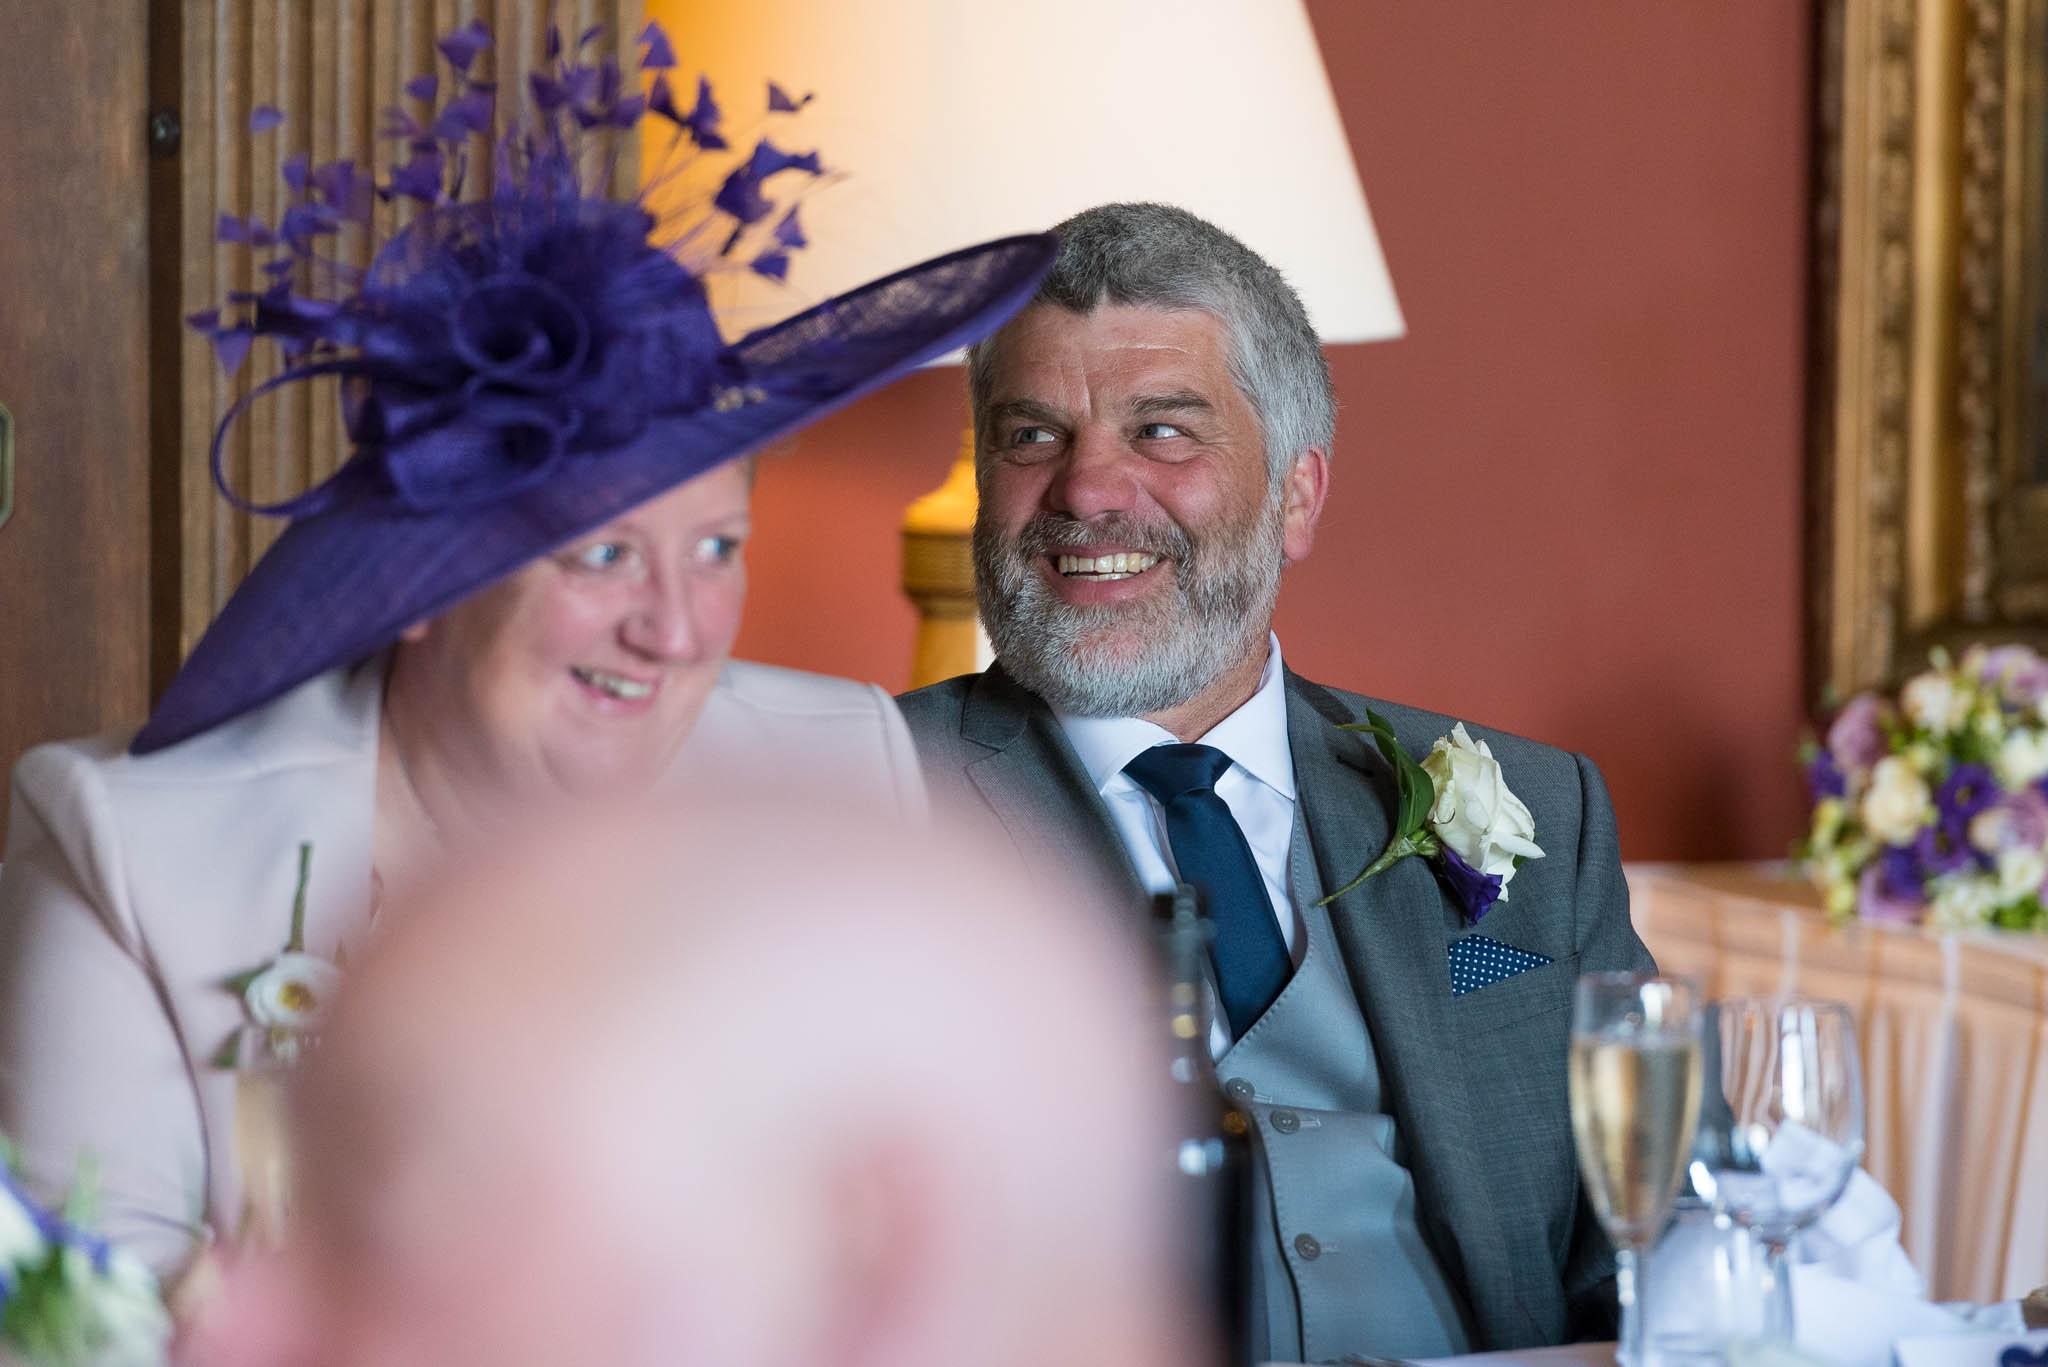 Crathorne Hall Hotel Wedding Photographer81.jpg